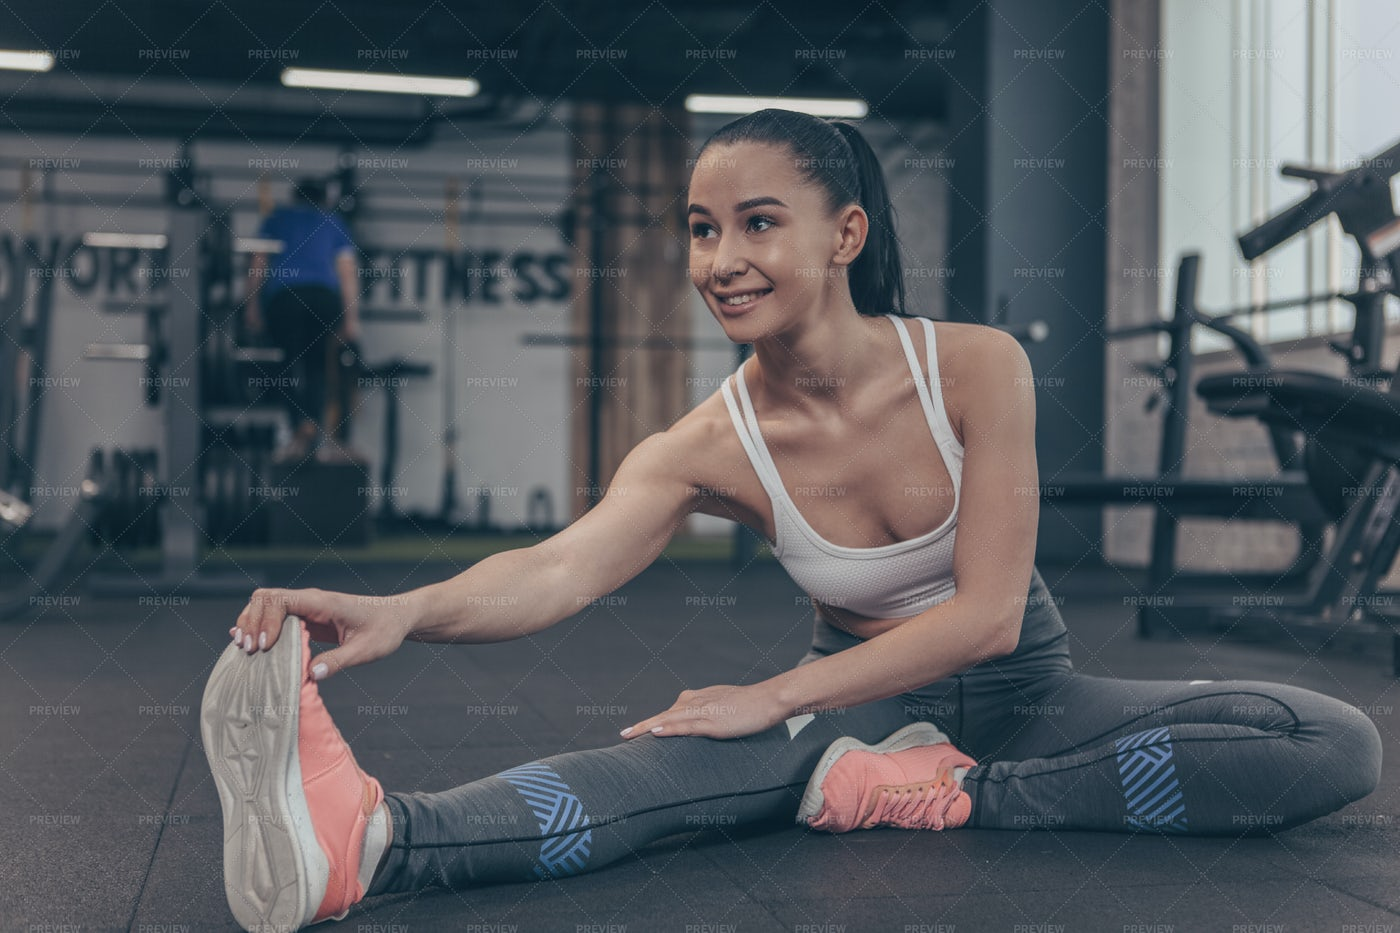 Flexible Woman At Gym: Stock Photos